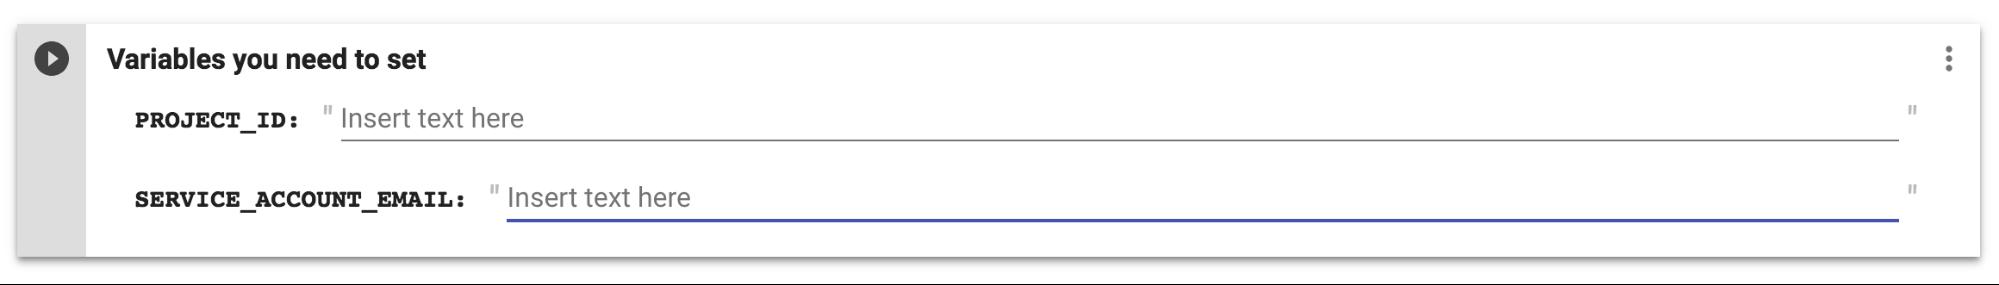 Defina o PROJECT_ID e o SERVICE_ACCOUNT_EMAIL do Google Cloud